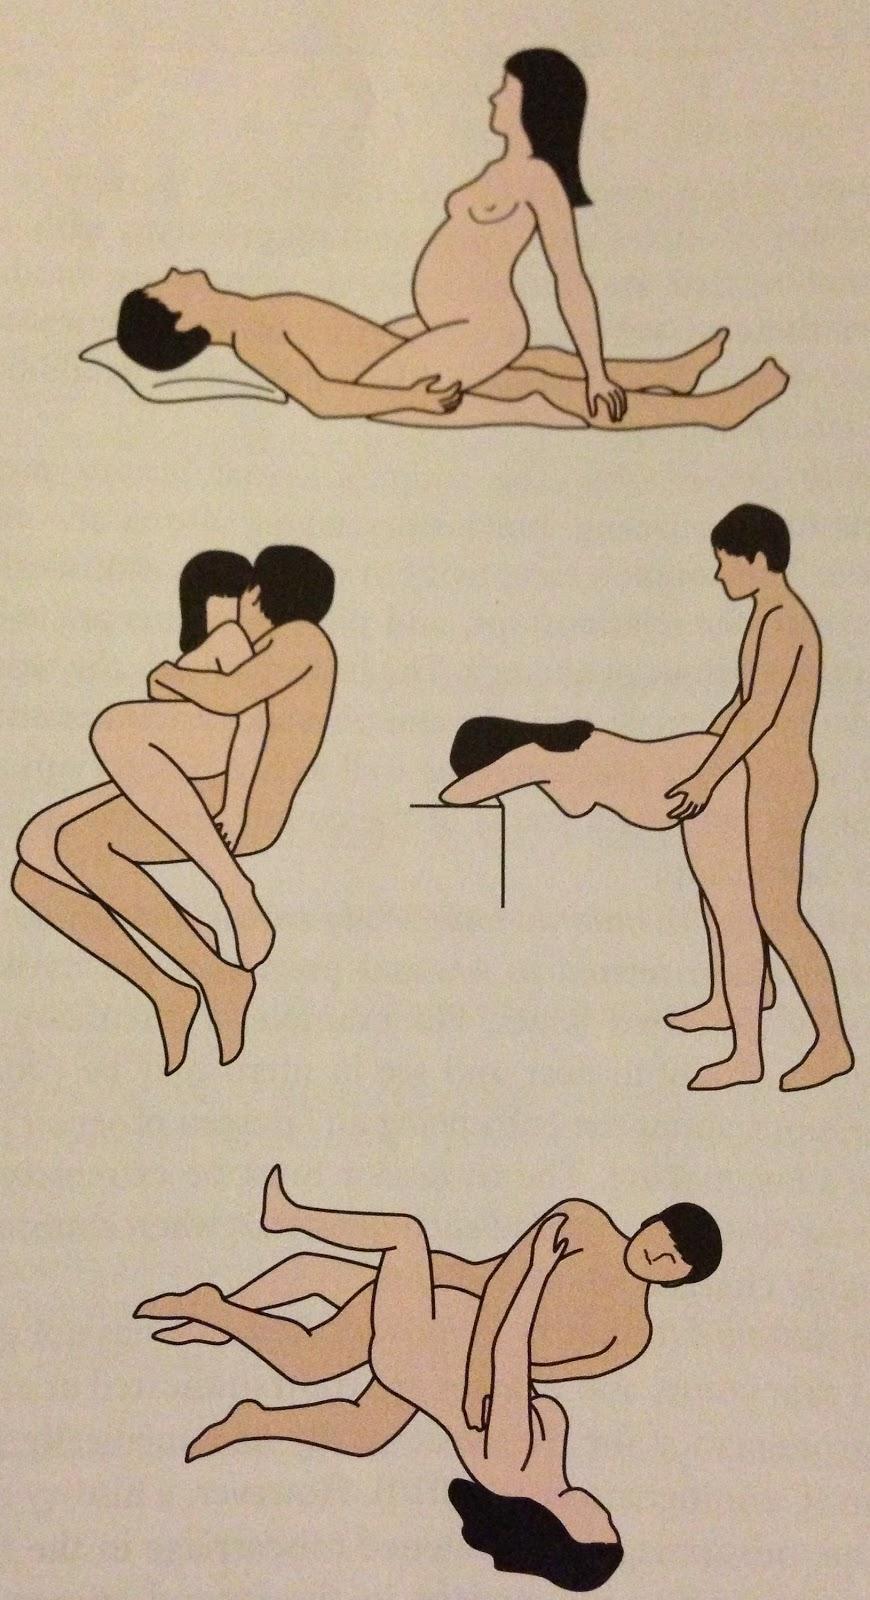 Cinsel iliЕџki pozisyonlarД± hakkД±nda bilgi hardcore photos